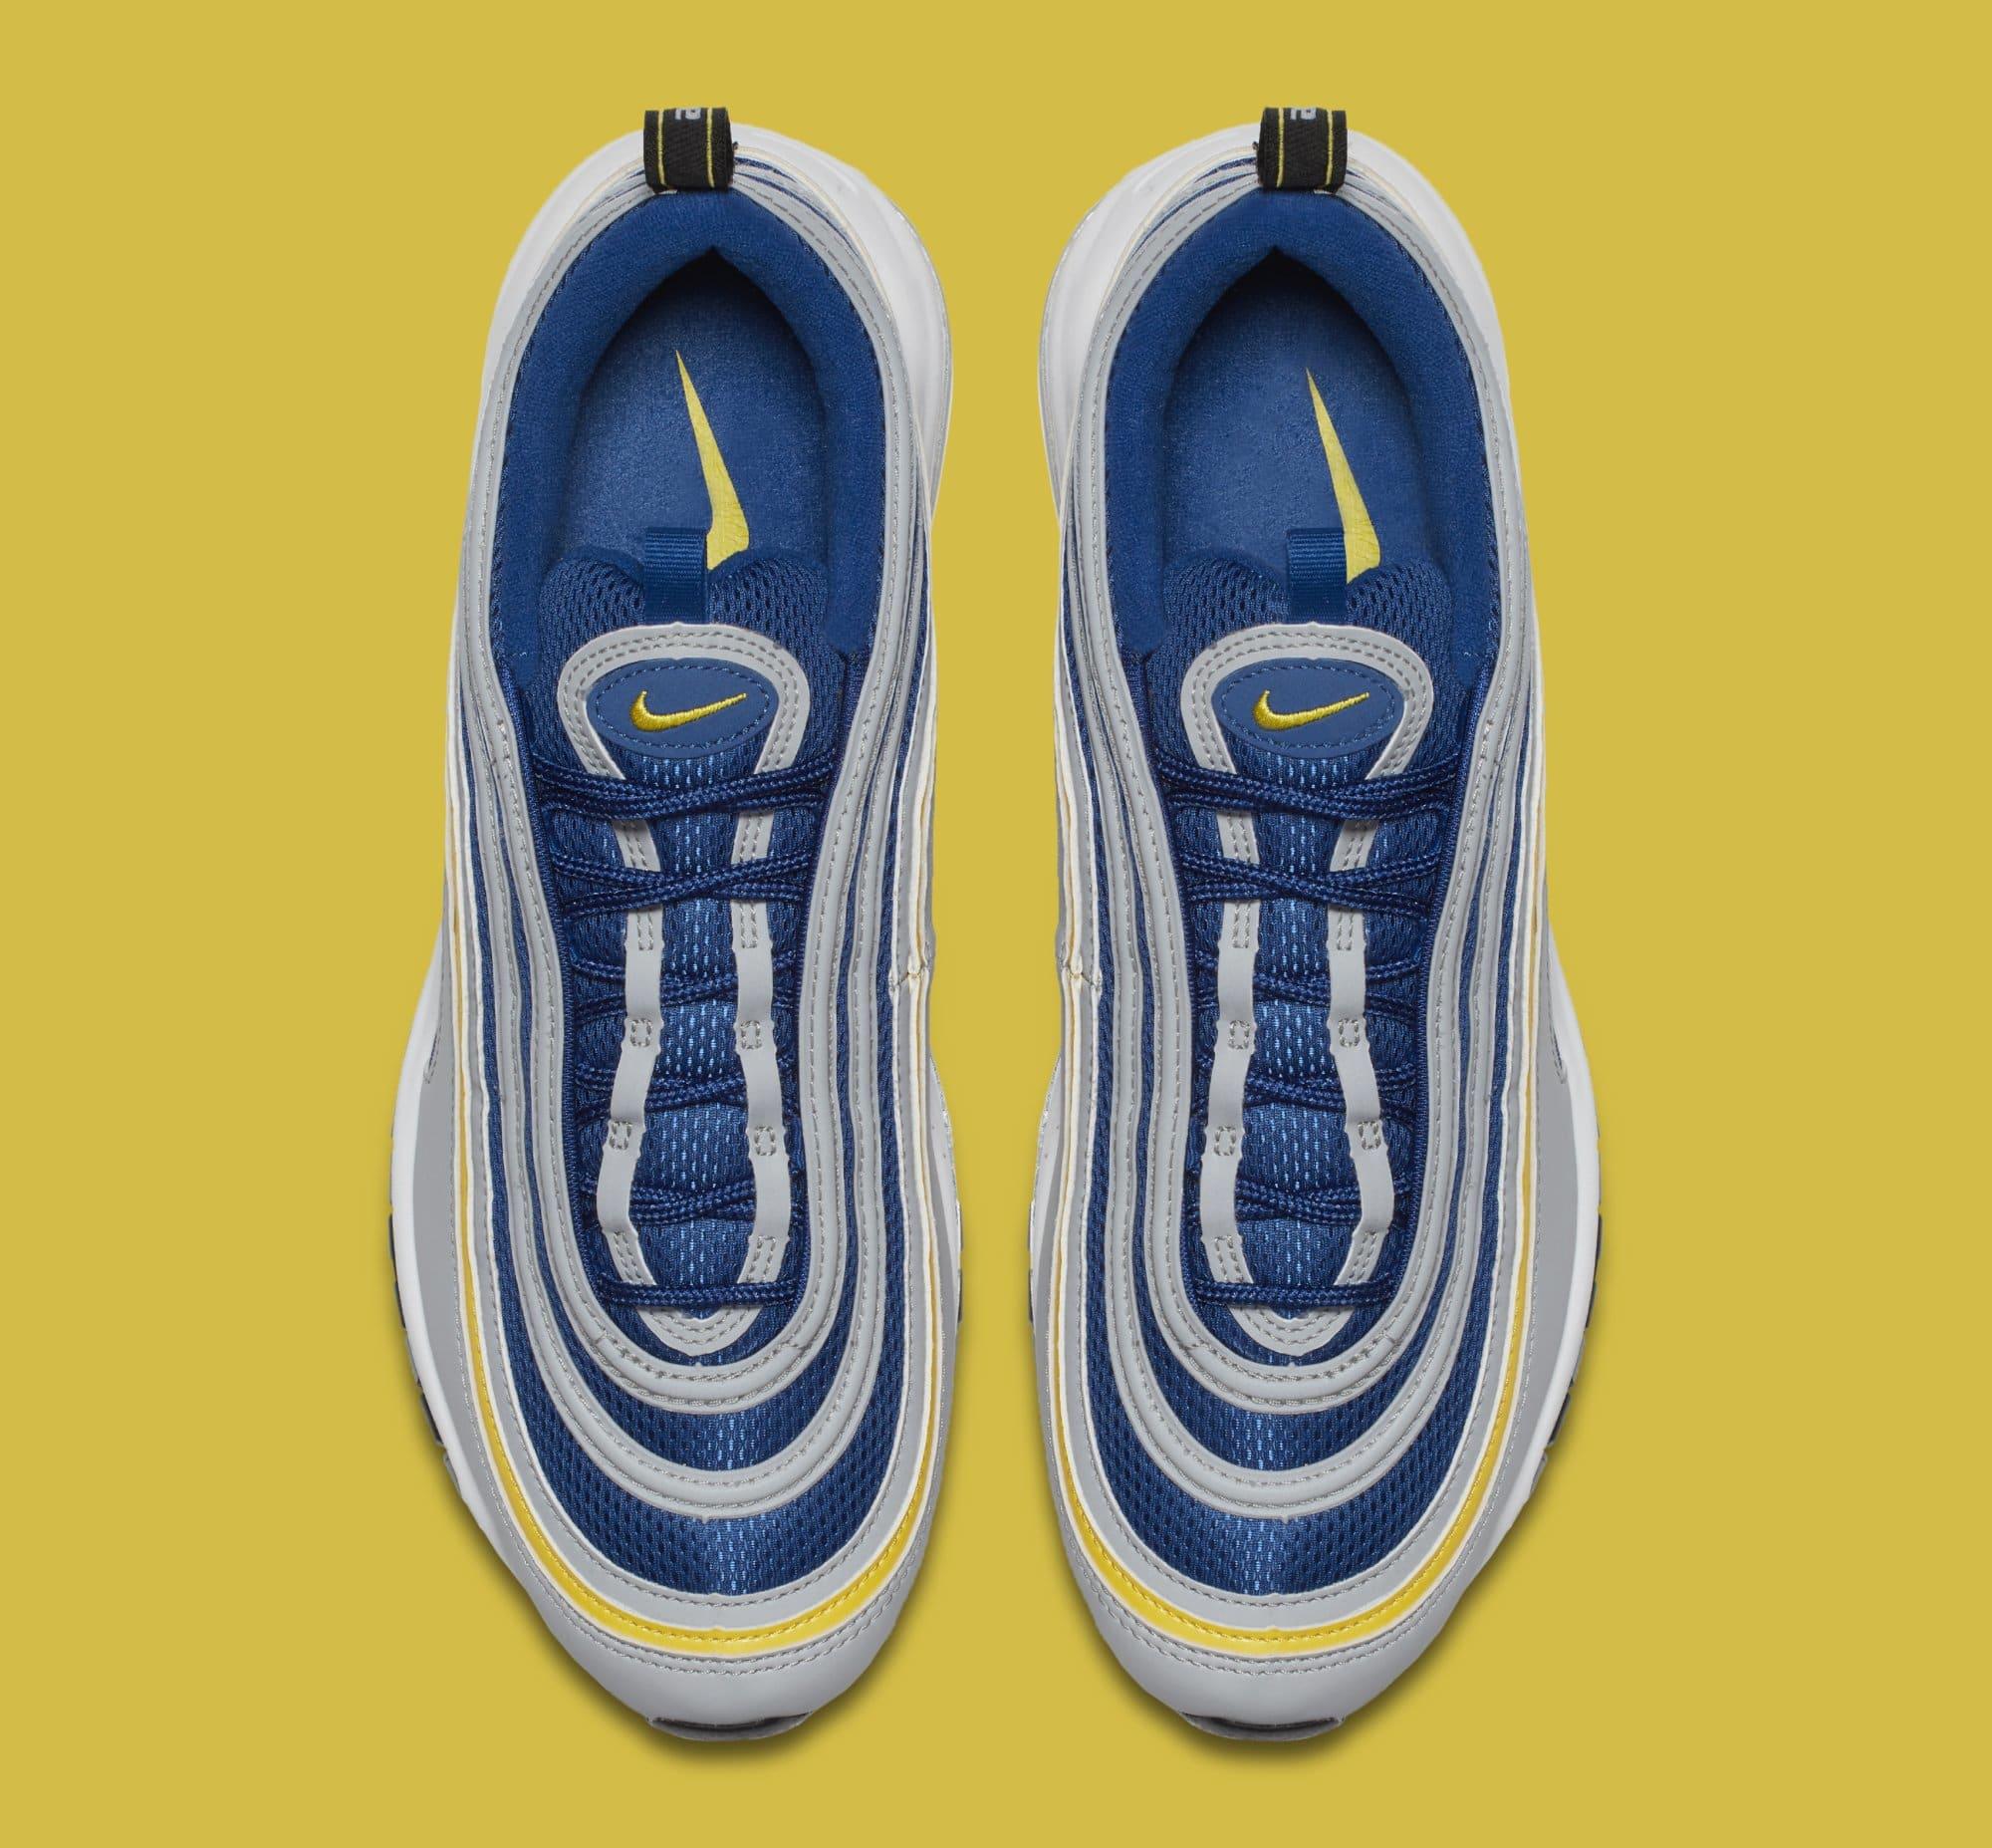 Nike Air Max 97 'Wolf Grey/Tour Yellow/Gym Blue' 921826-006 (Top)